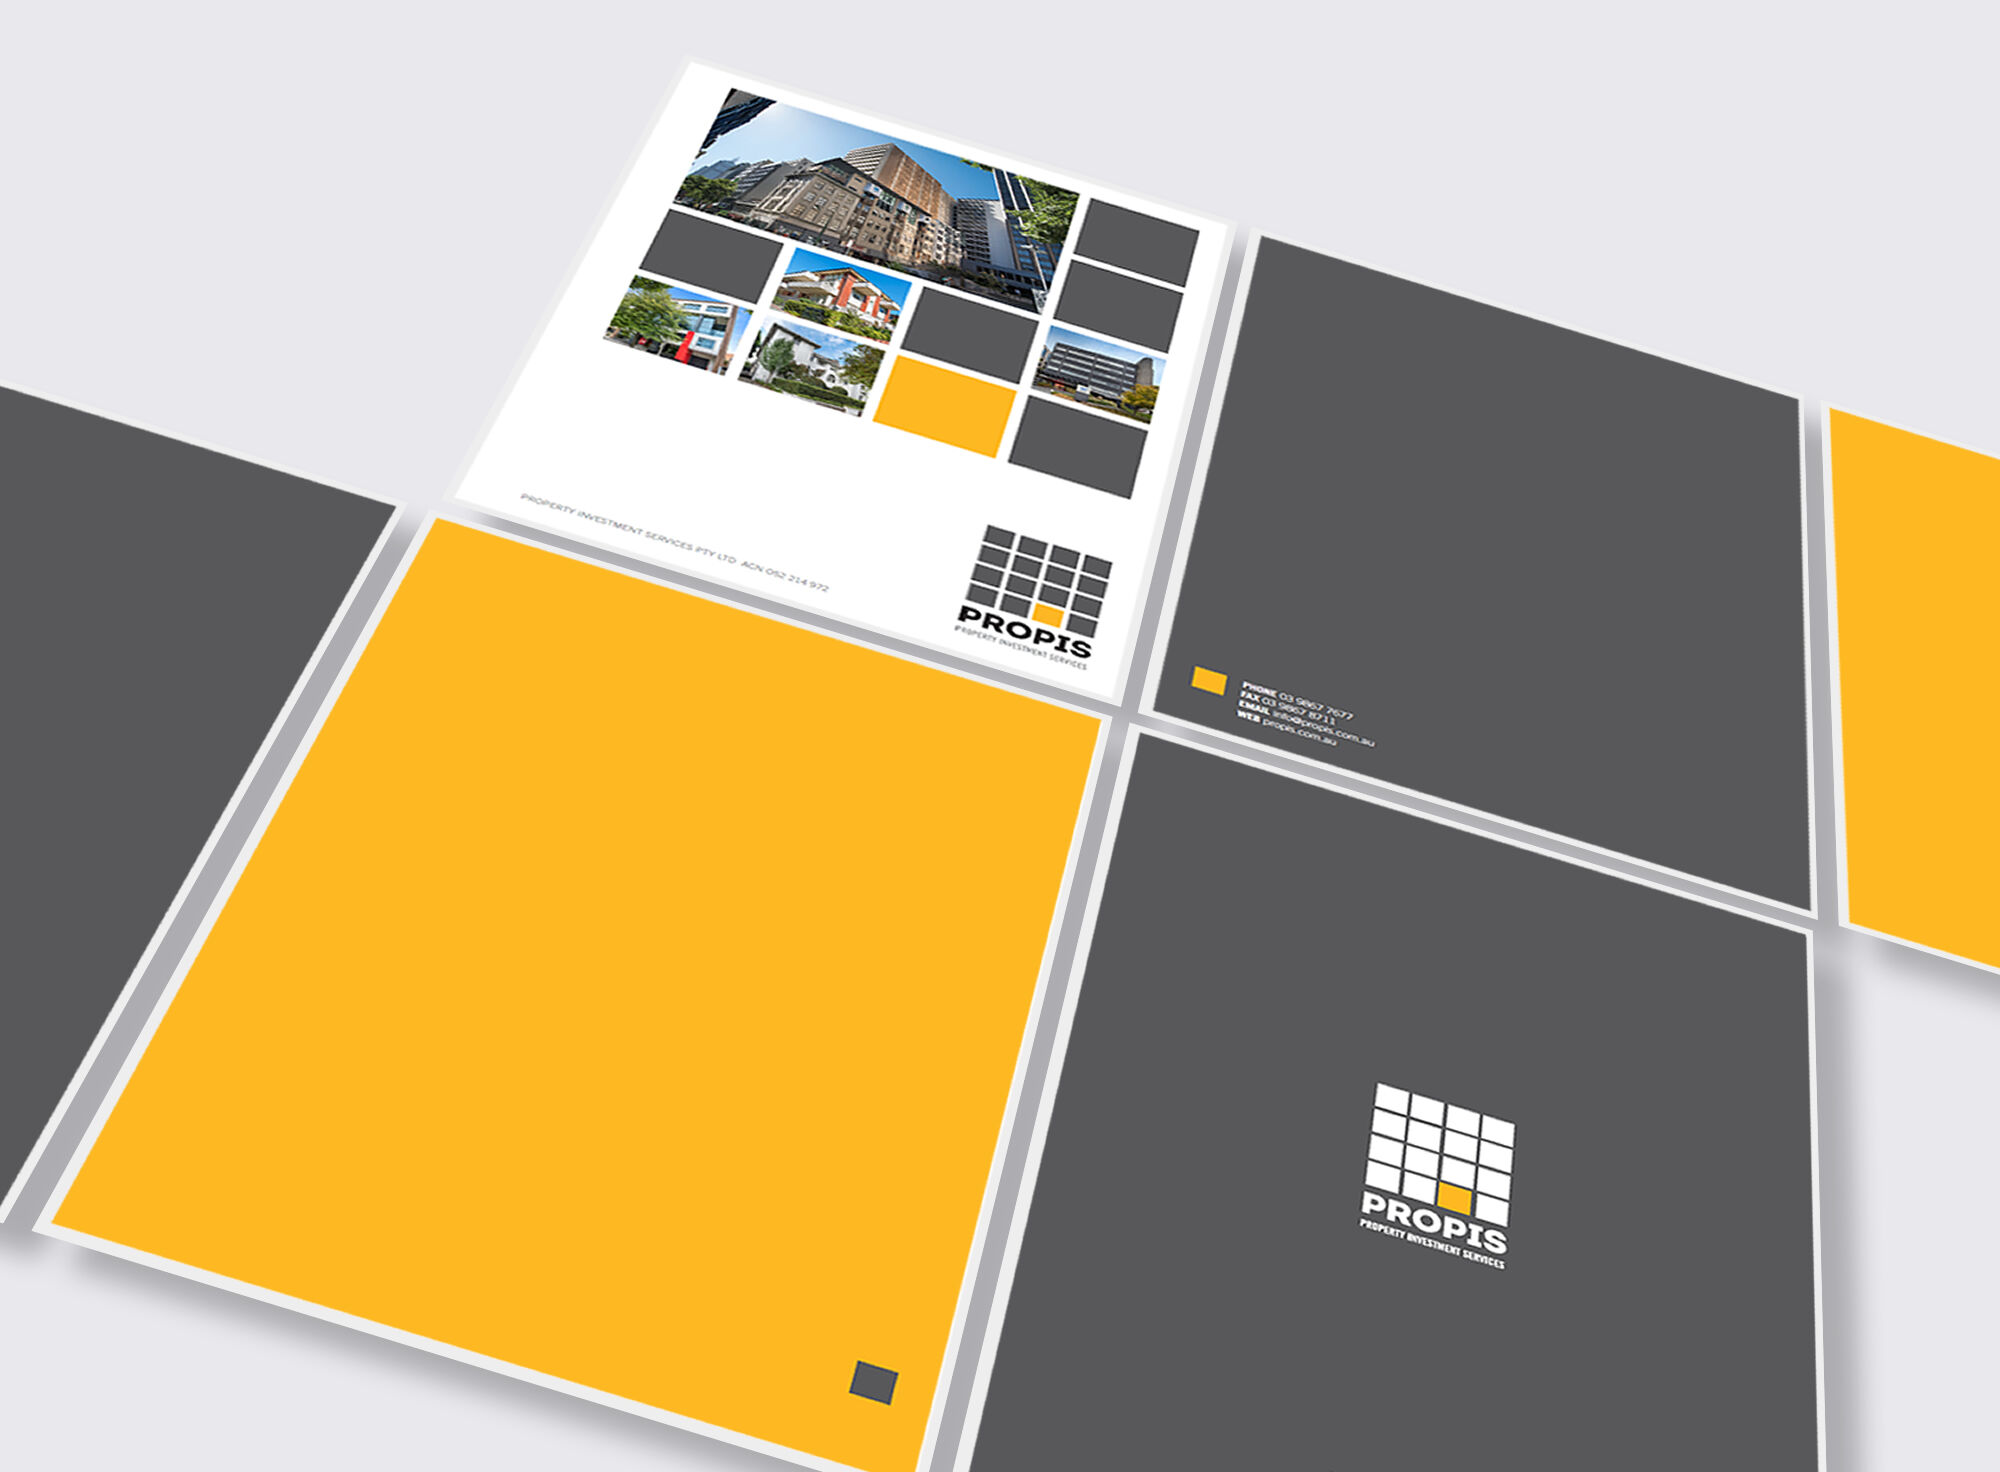 PROPIS presentation folders